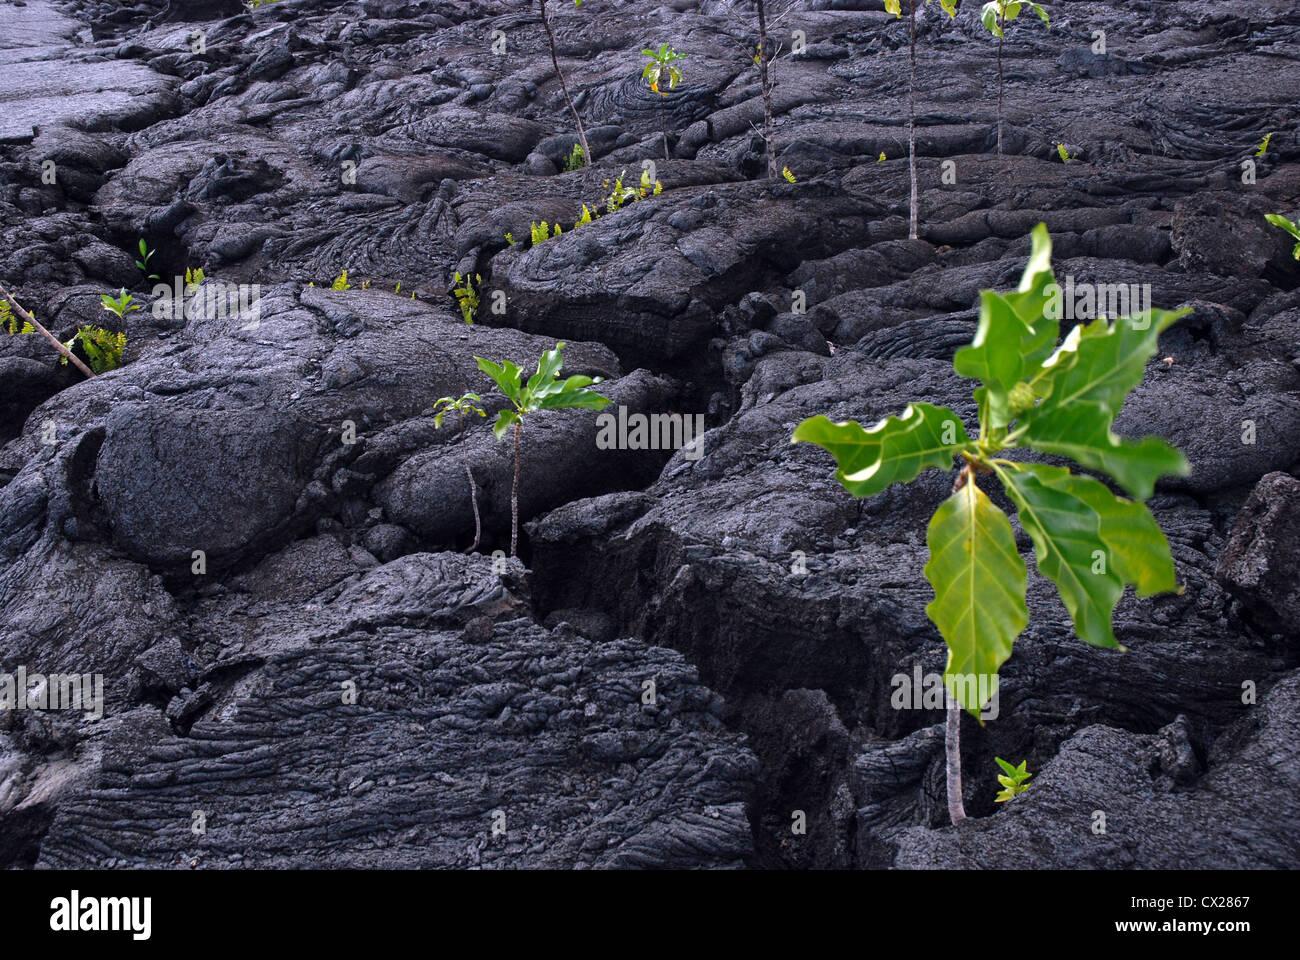 vegetation growing out of hardened lava, Saleaula lava field, Savai'i, Samoa.  Following 1905-1911 eruptions - Stock Image